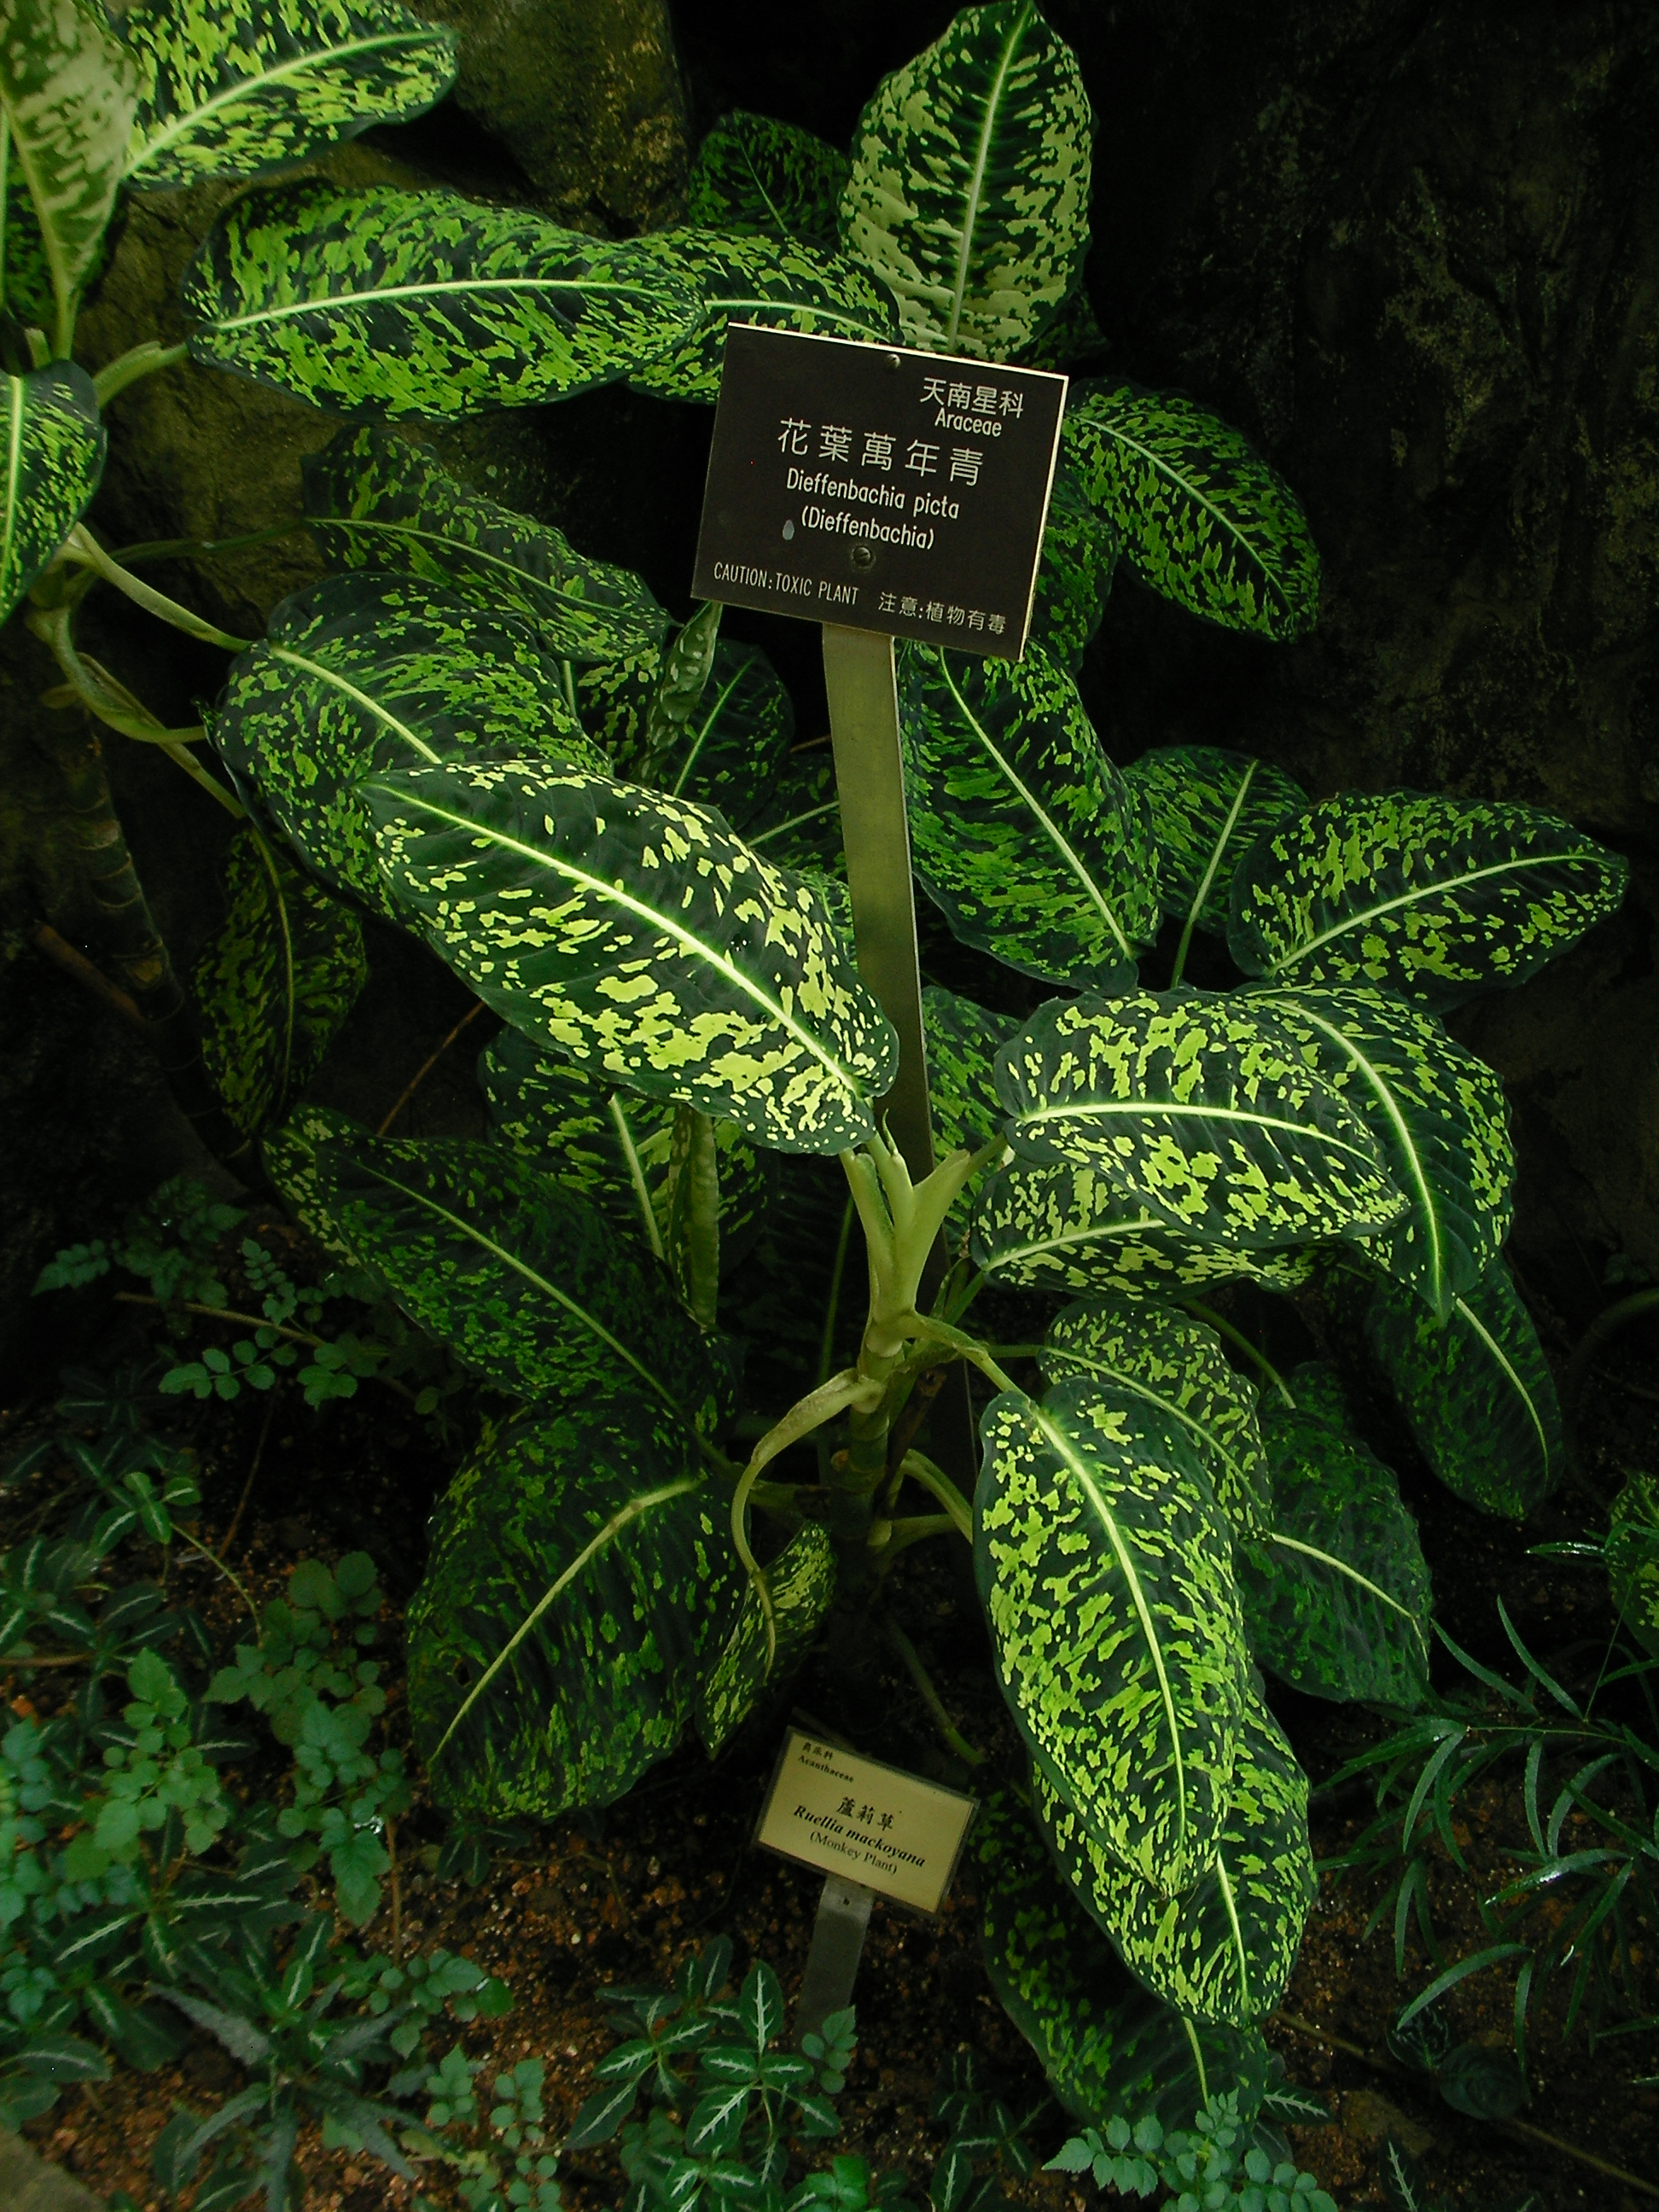 File:Dieffenbachia picta.jpg - Wikimedia Commons